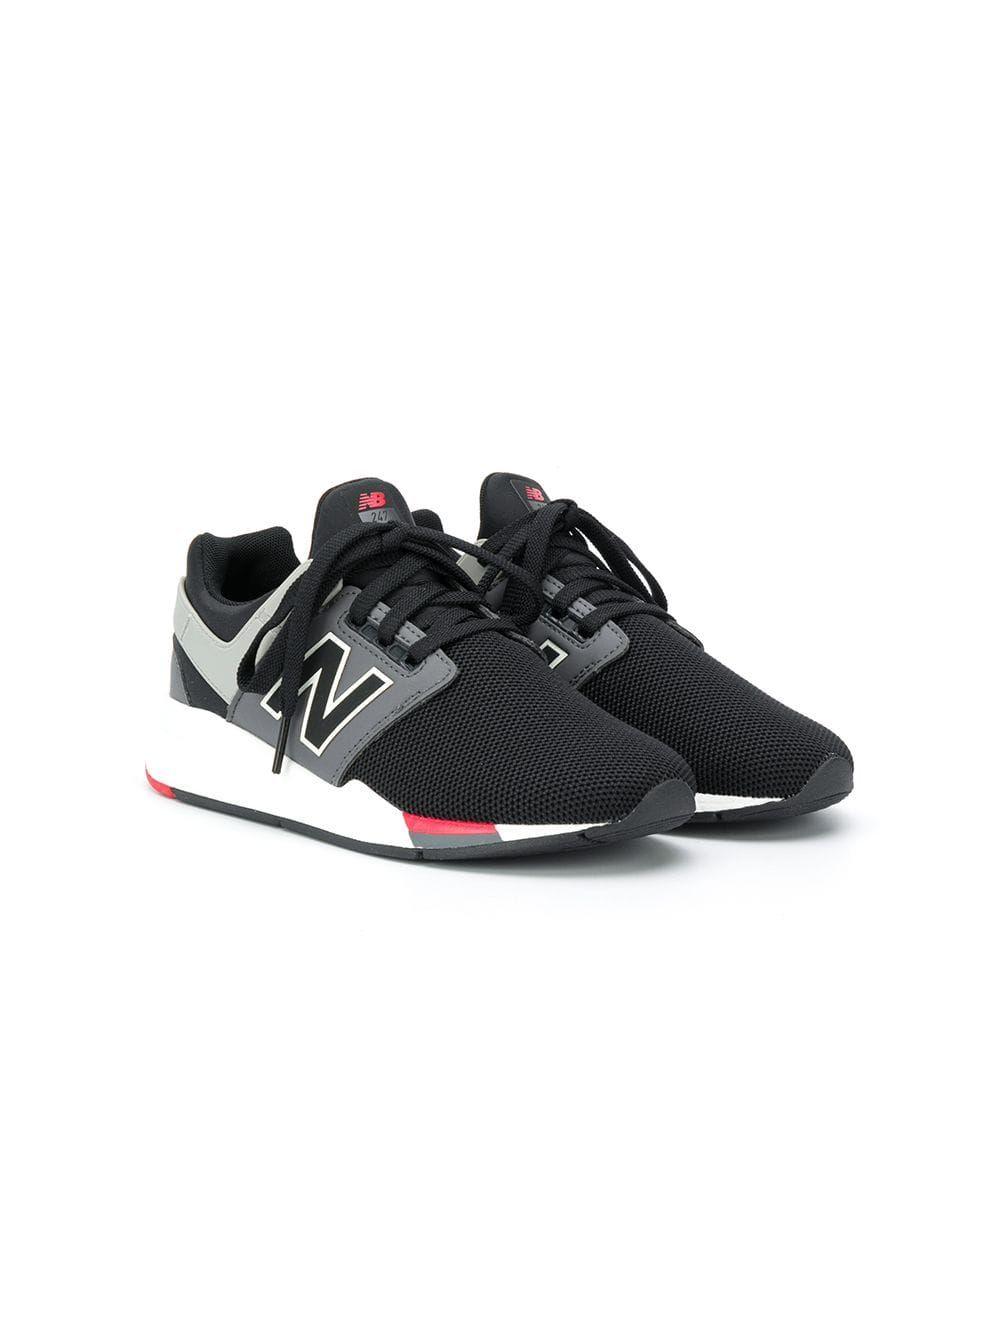 New Balance Kids 247 Sneakers | New